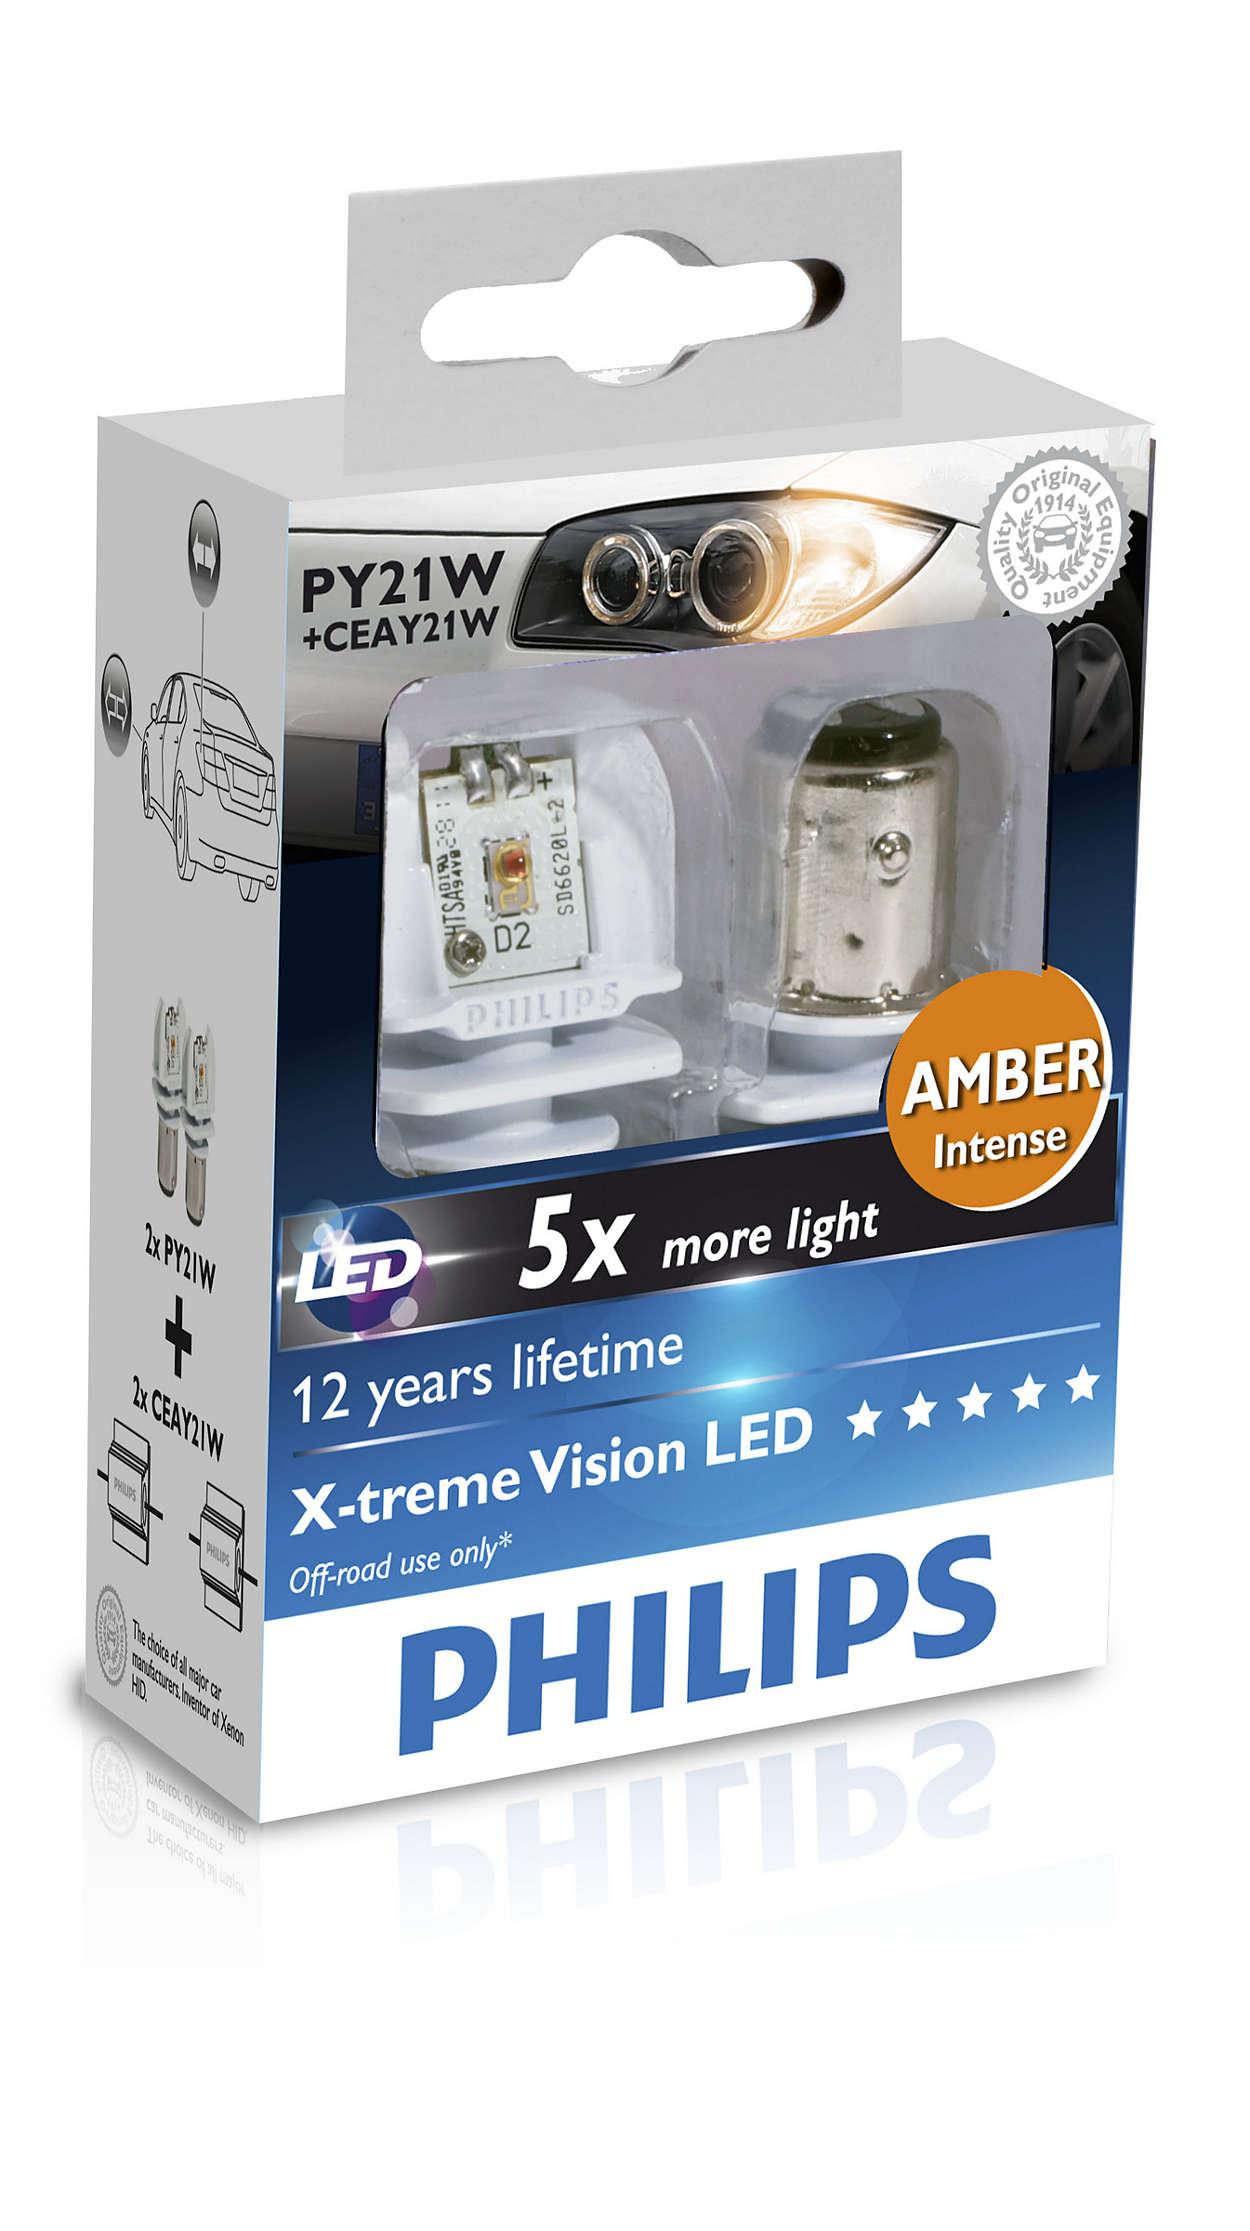 LED de alto rendimiento